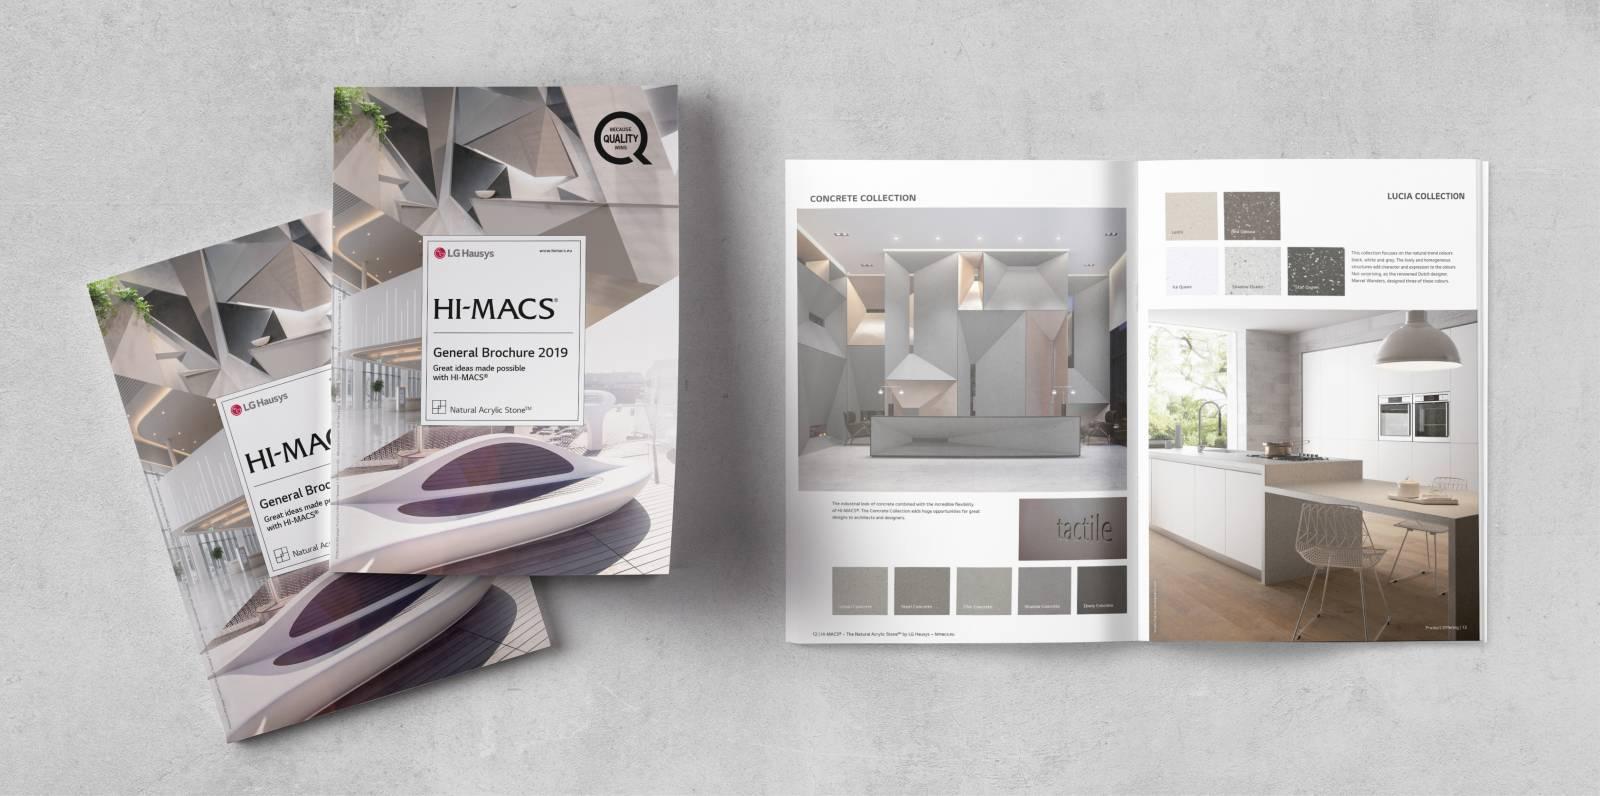 lgch-1001_header_new_brochures_2019_300dpi_rgb